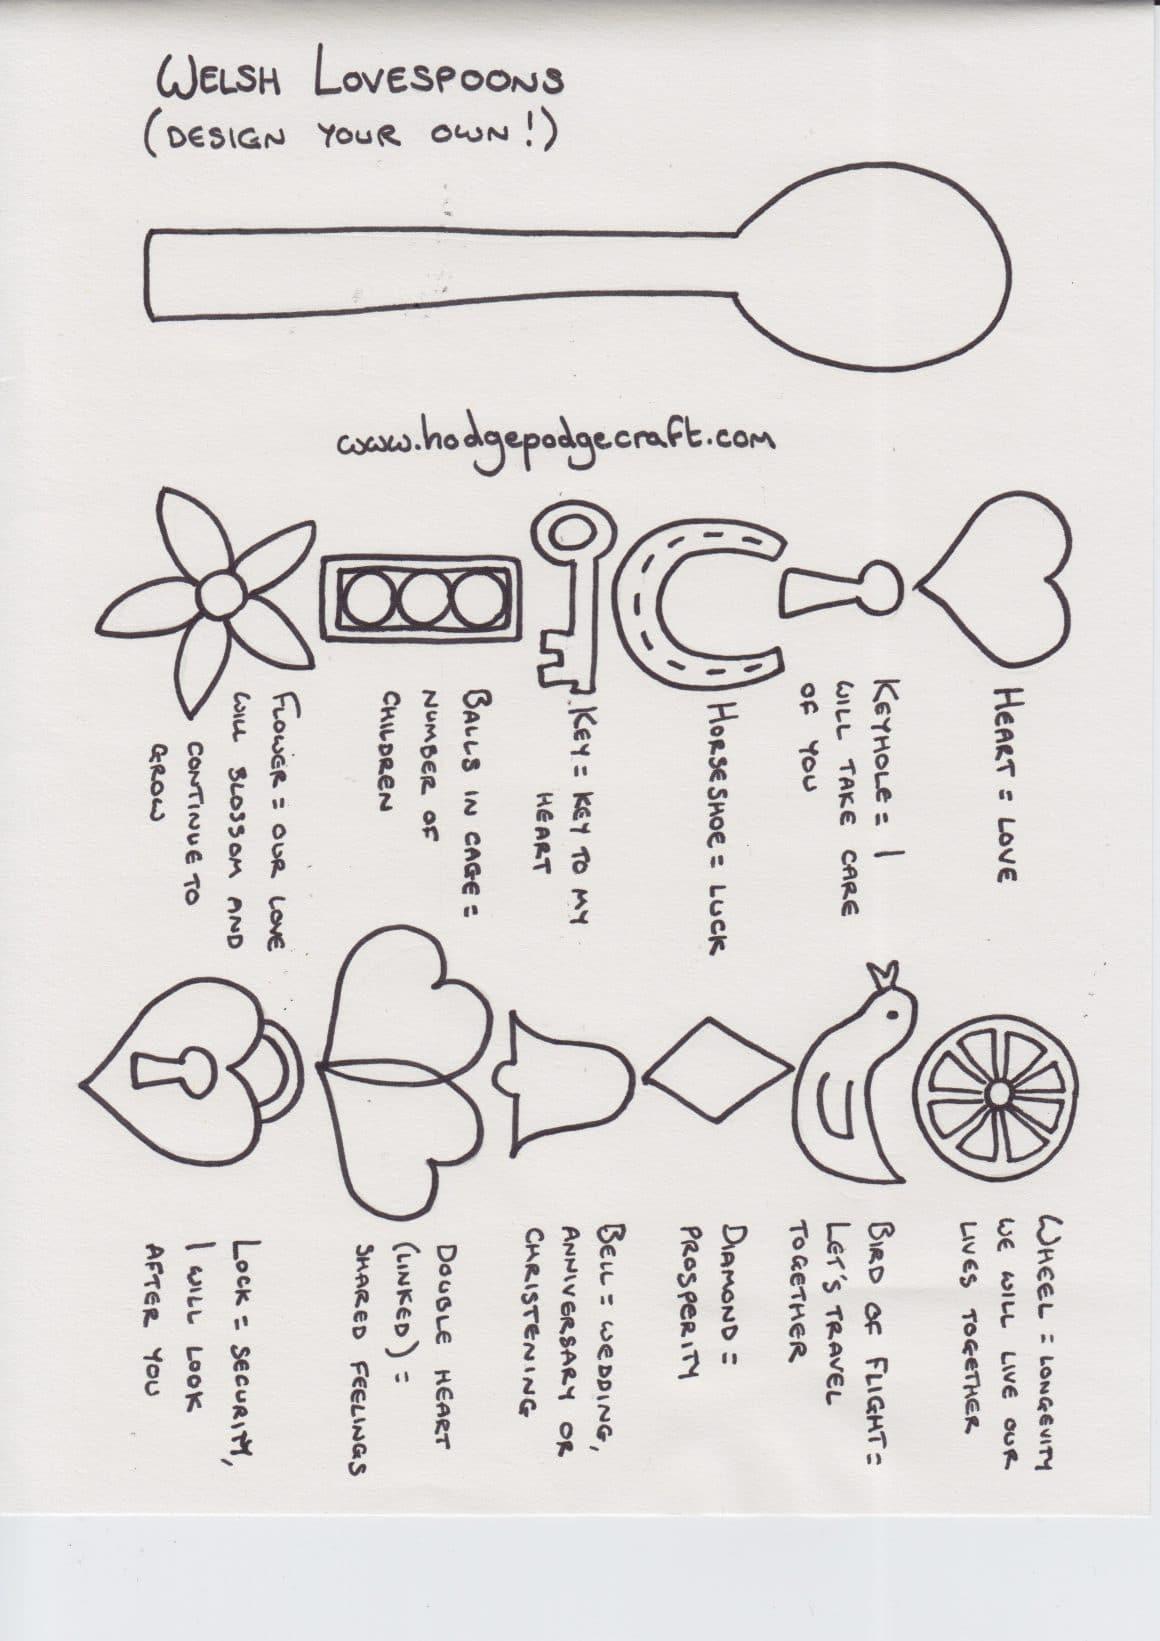 st david 39 s day crafts love spoons daffodils. Black Bedroom Furniture Sets. Home Design Ideas